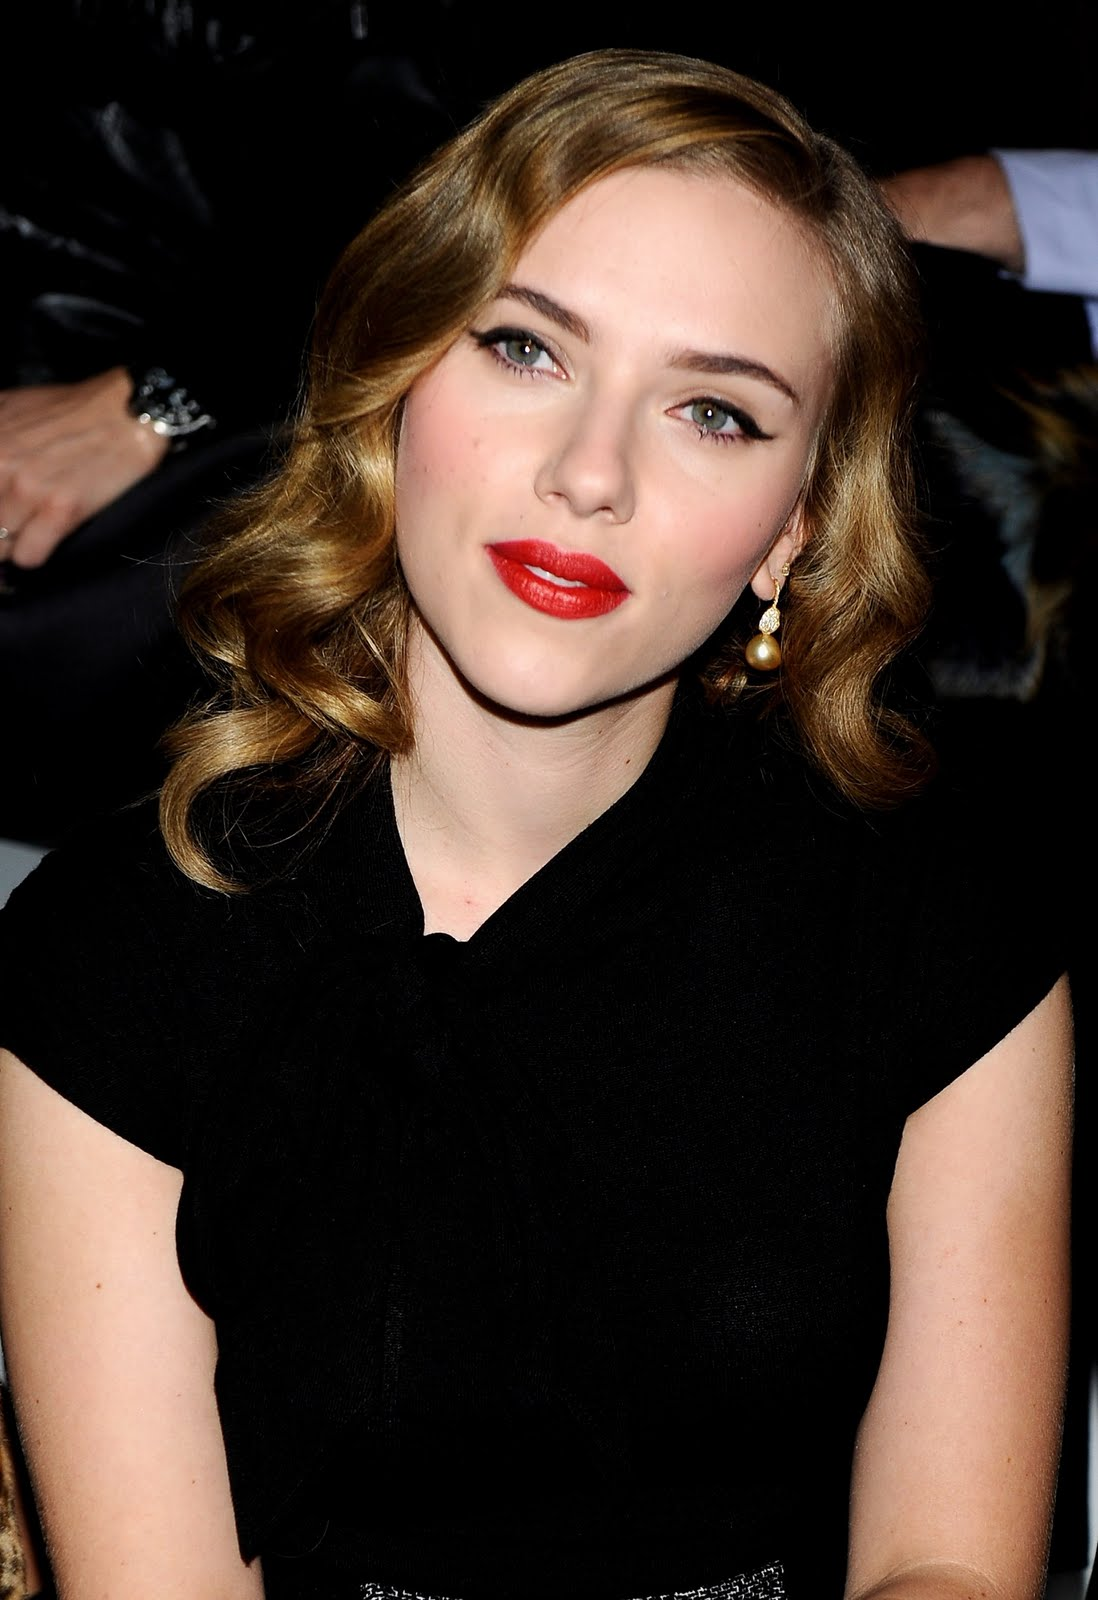 Scarlett johansson special pictures 8 film actresses - Scarlett johansson blogspot ...